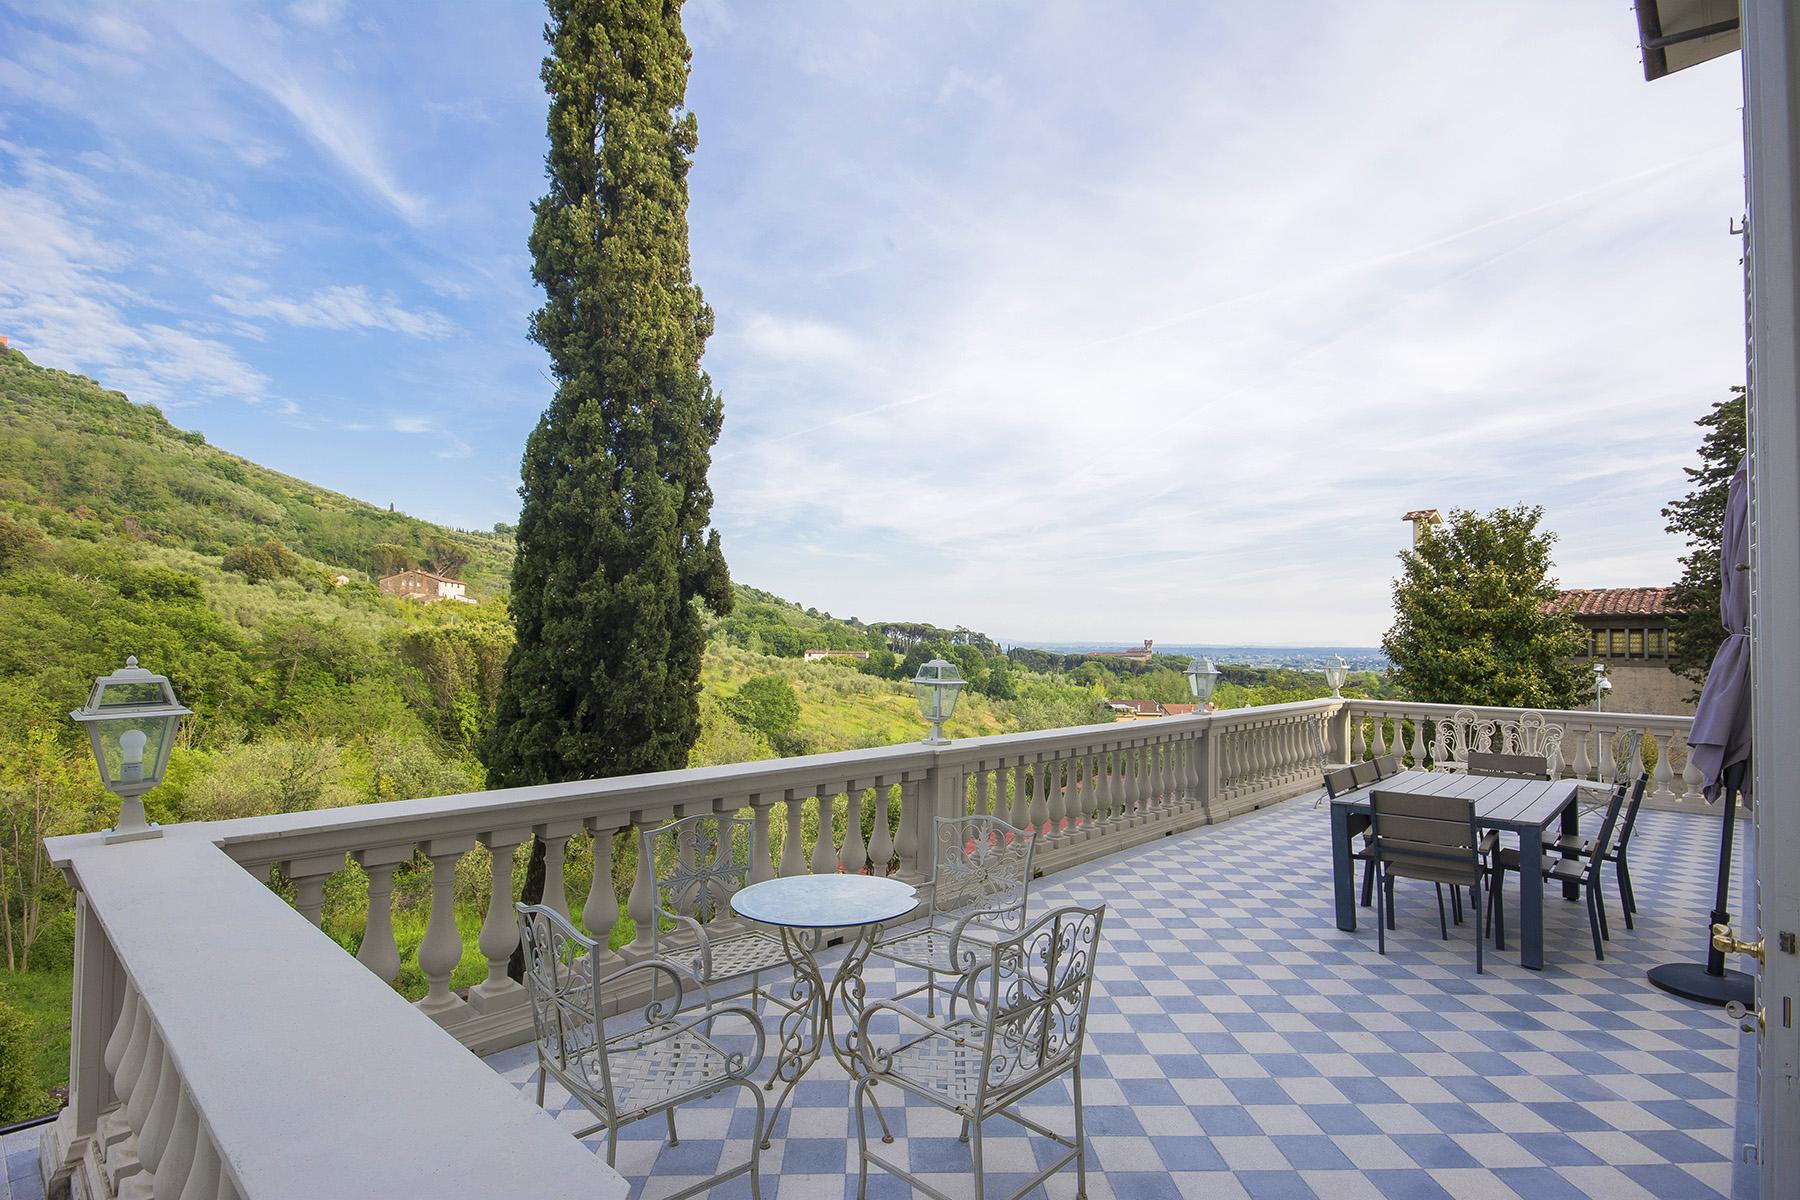 Montecatini Terme小镇优雅的新艺术风格的别墅 - 6